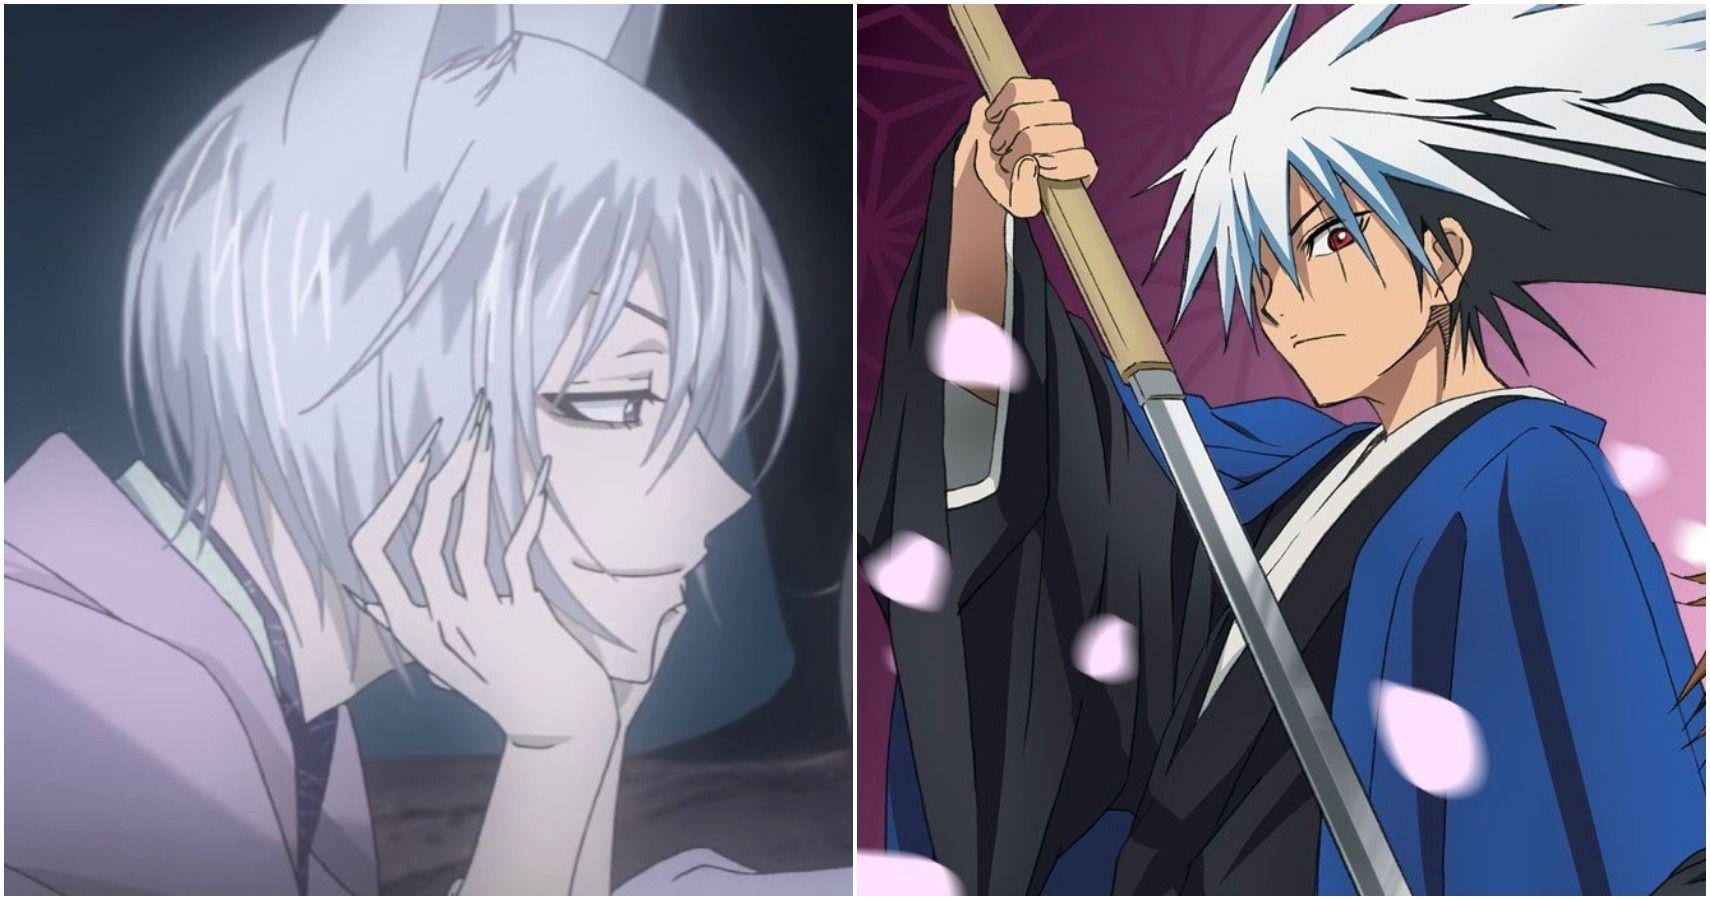 10 Anime To Watch If You Love InuYasha | CBR